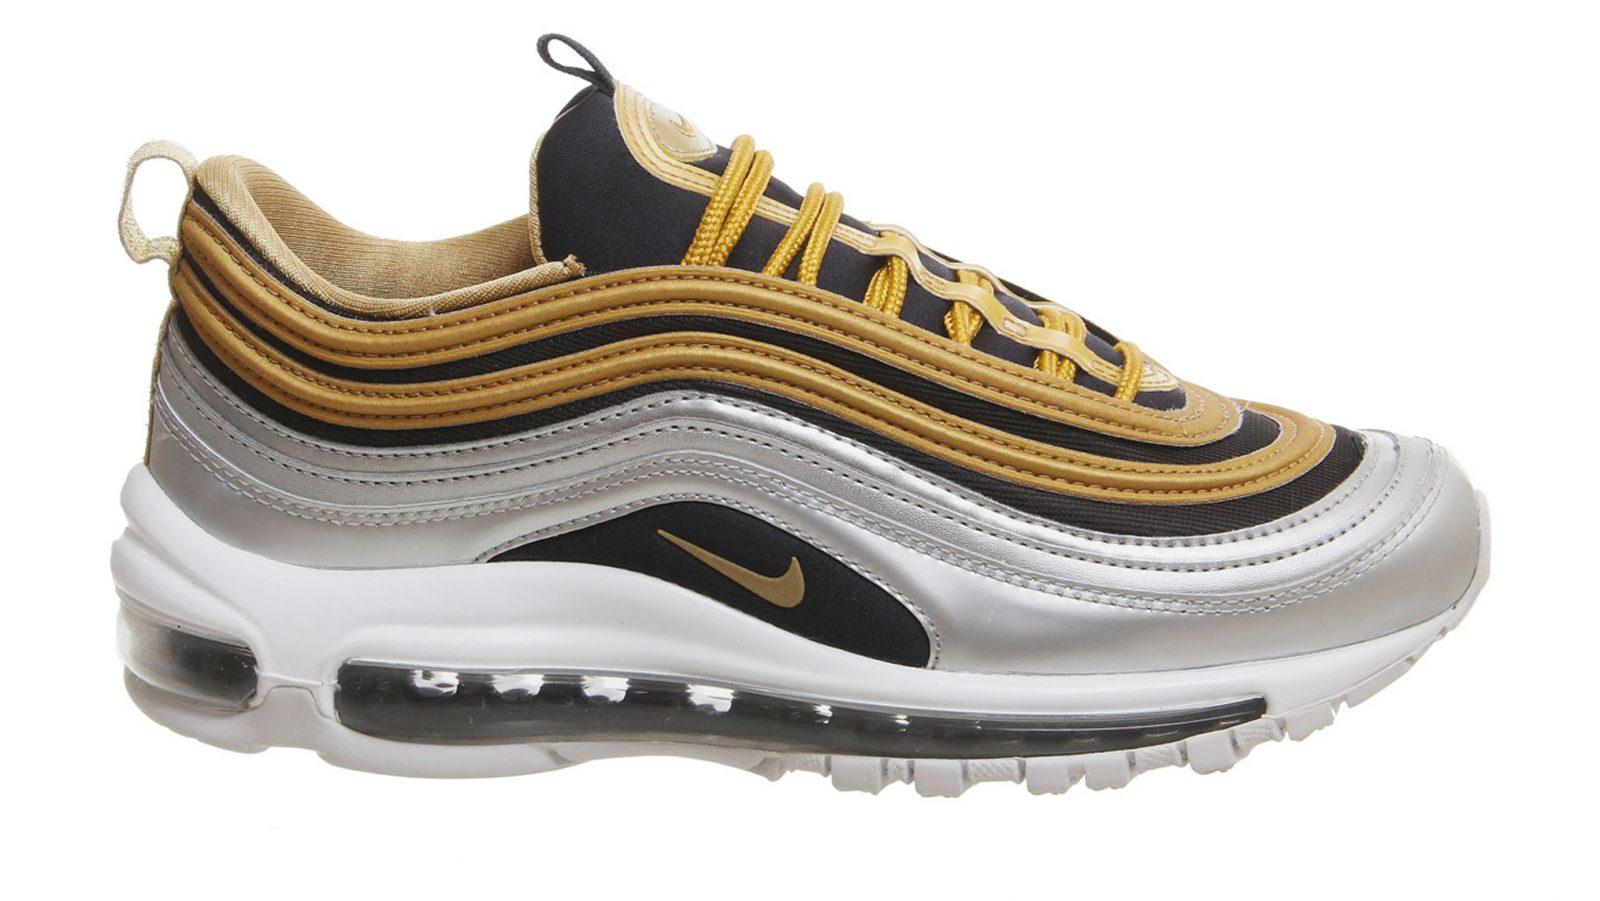 Nike Wmns Air Max 97 LX BV1974 001 (damen) Sneaker Shop